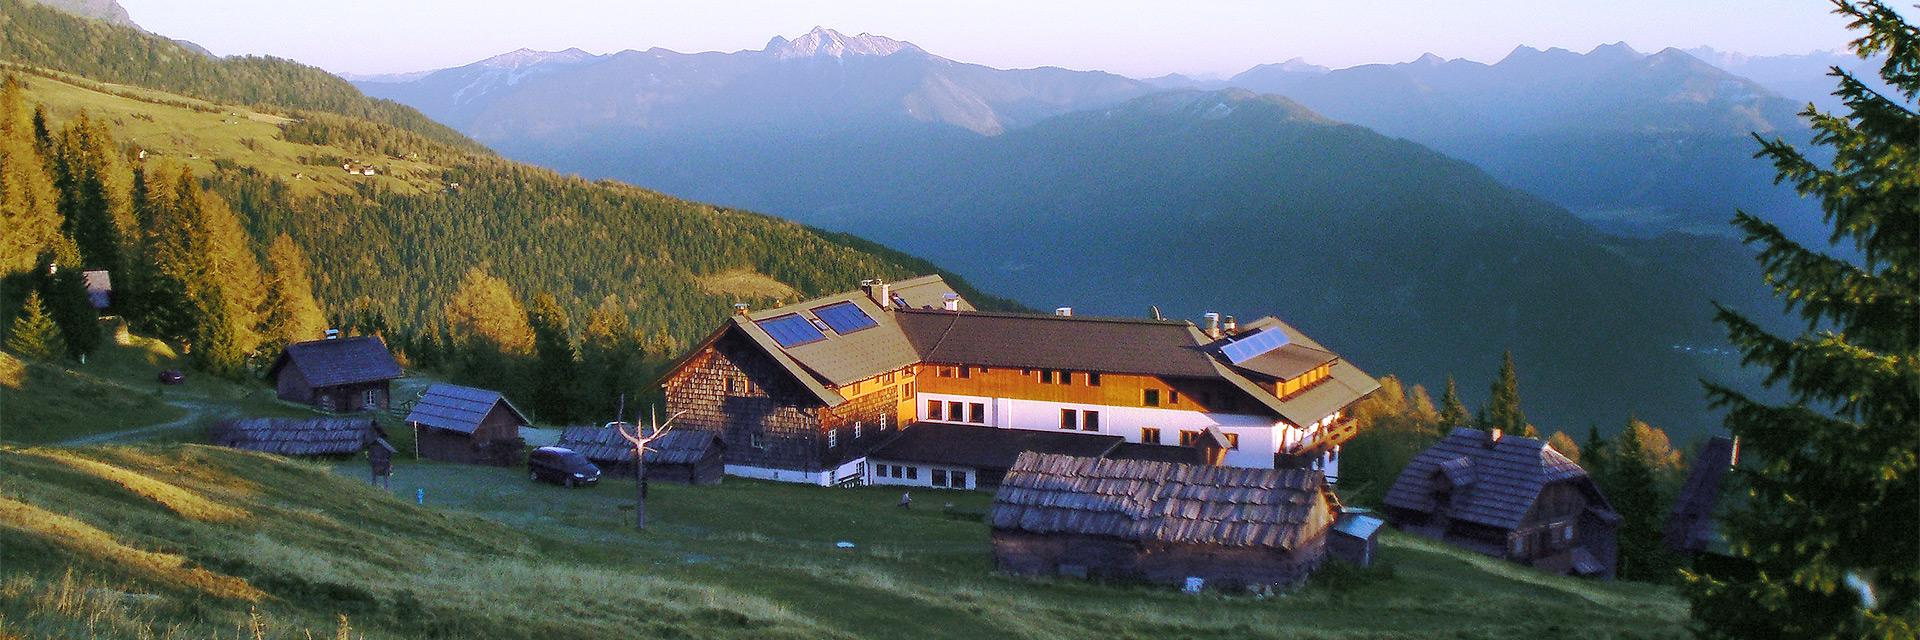 sattlegger alpenhof ferienwarte